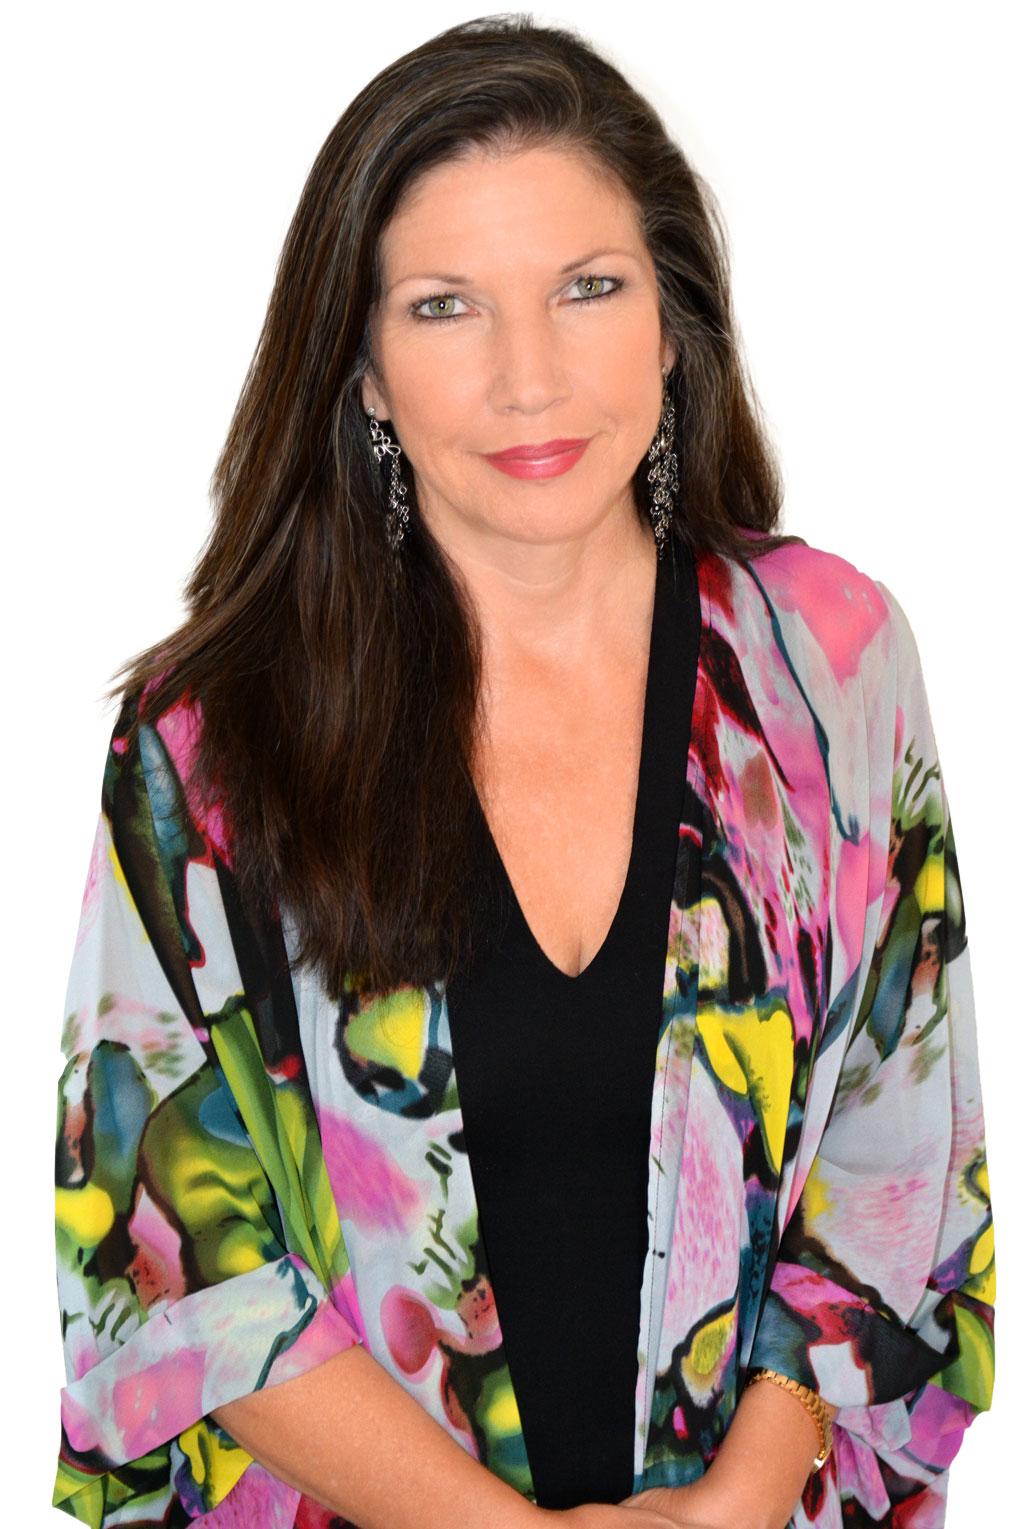 Spiritual Healer - Cynthia Branchflower